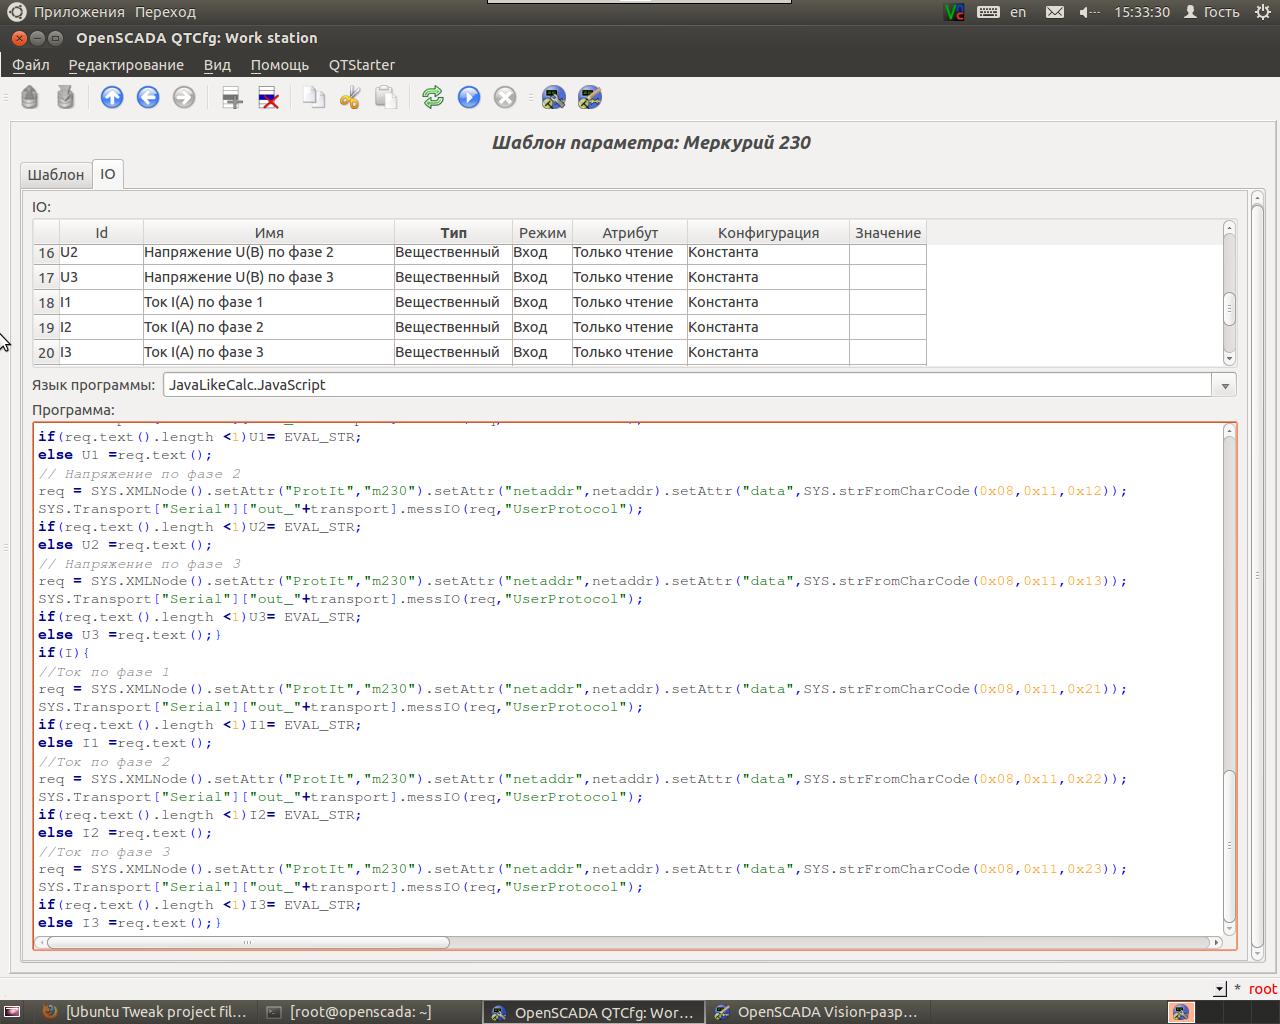 Пишем протоколы счетчиков Меркурий 230 и Меркурий 200 для OpenSCADA - 16